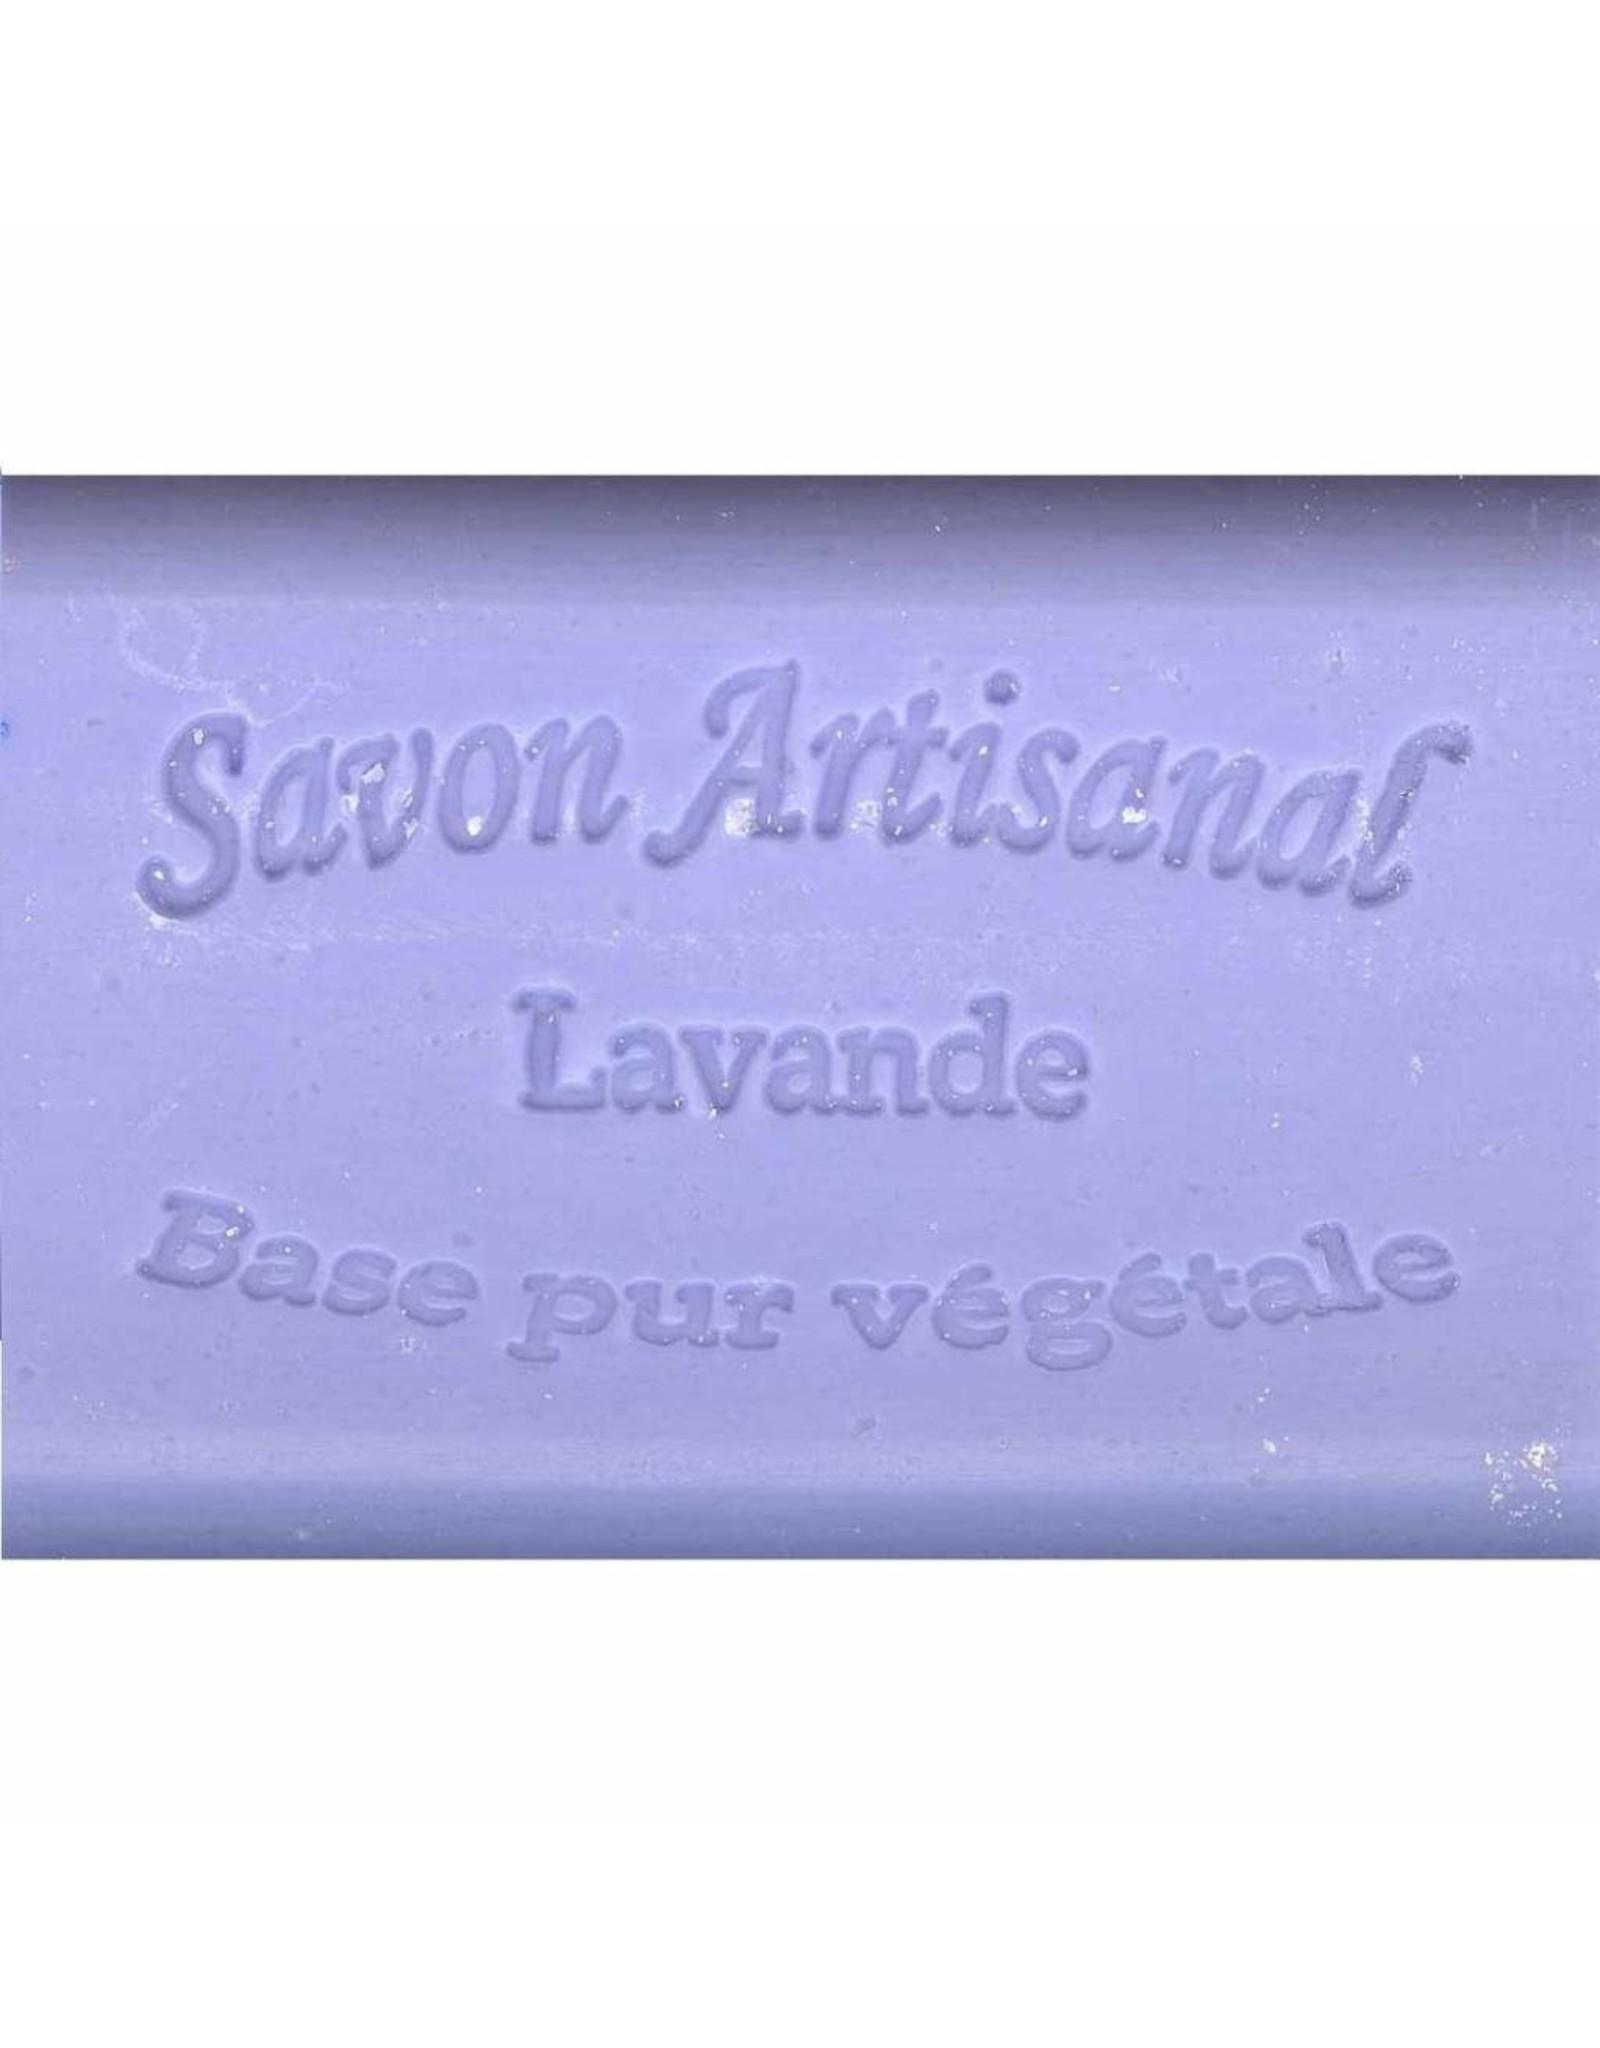 Ambachtelijke zeep 'Lavendel' - Body & Soap